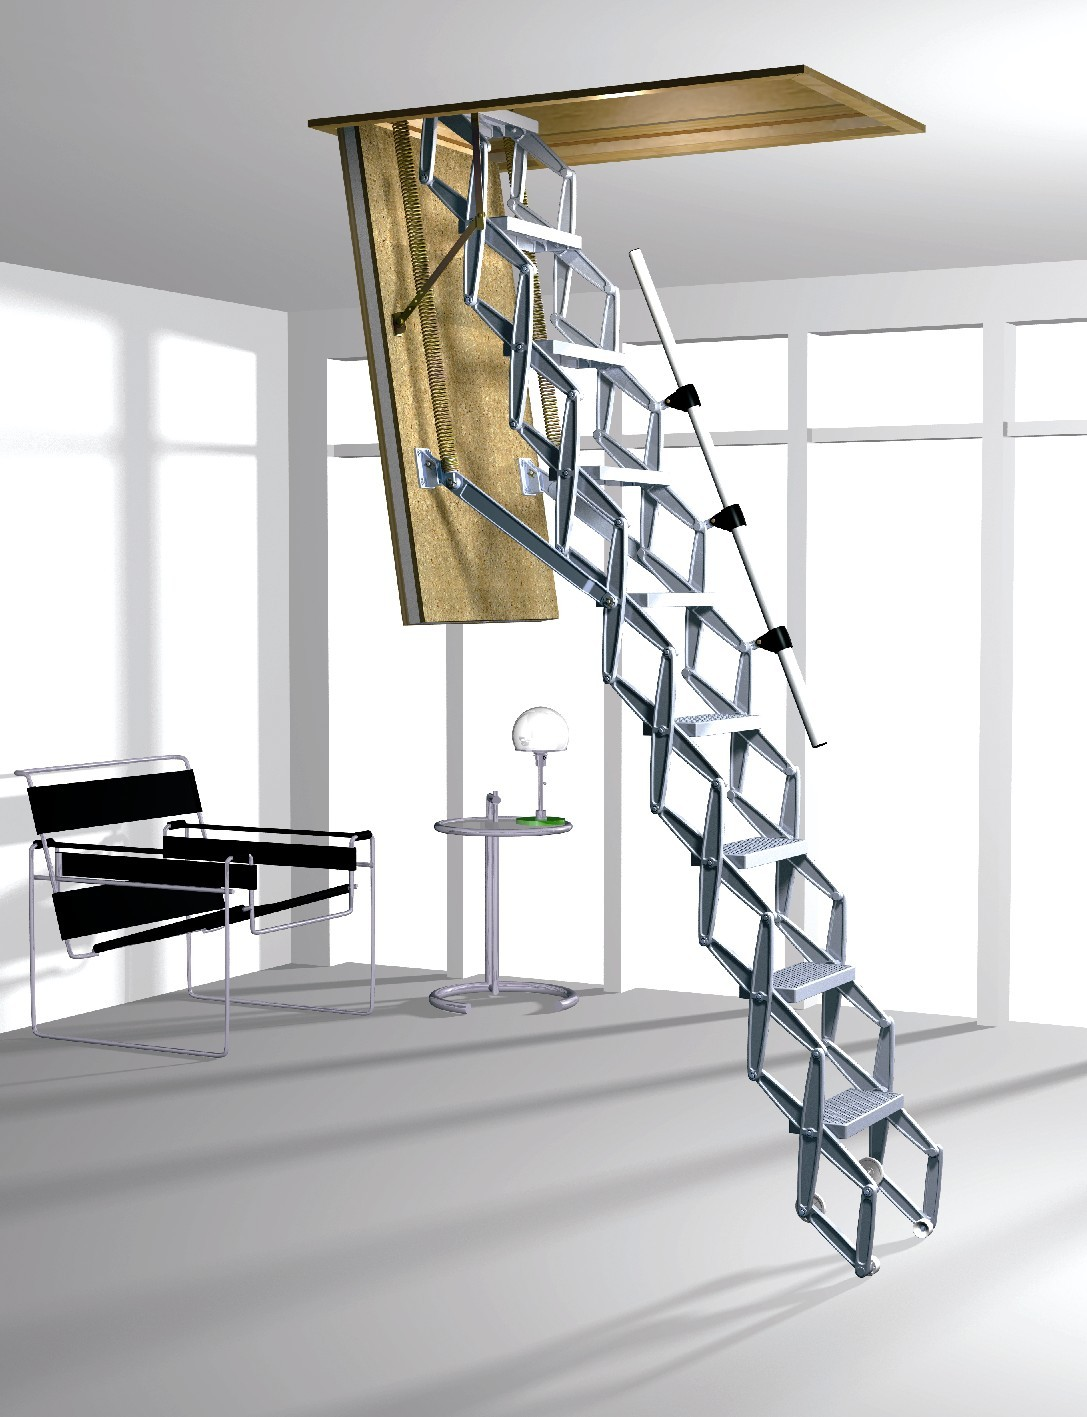 Elektrikli 199 Atı Merdiveni Elektrikli 199 Atı Merdiven